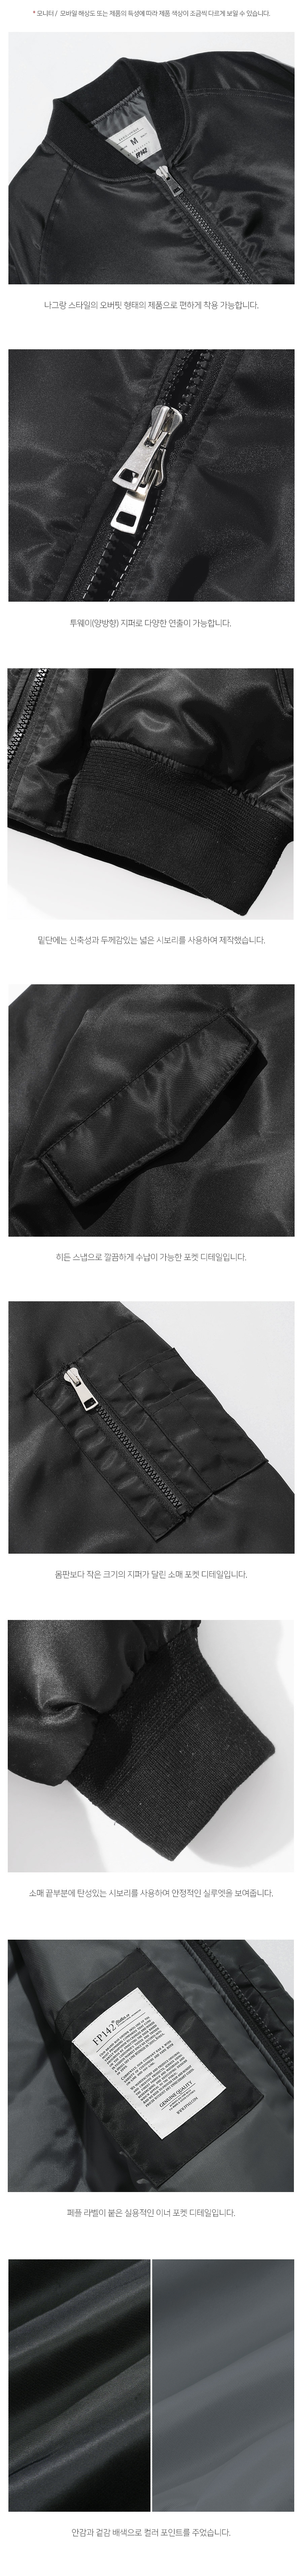 5_SJOT1303_detail_black_color02_ky.jpg